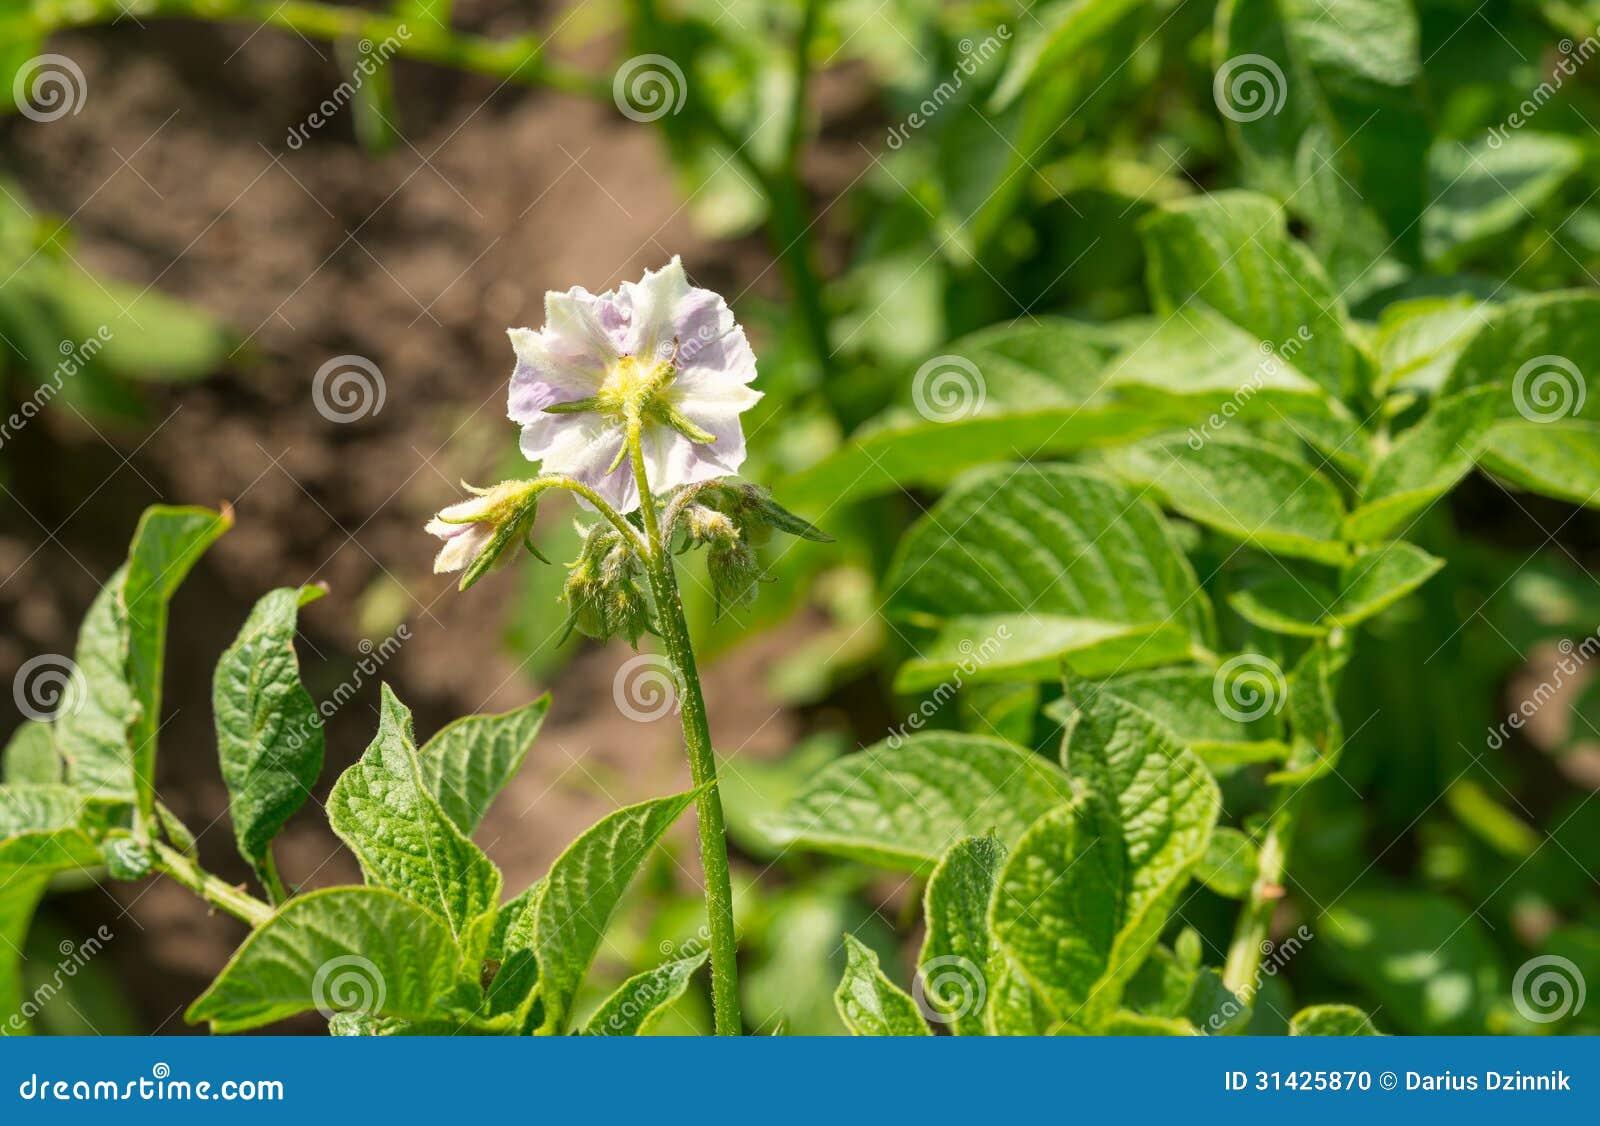 Potato Flower Stock Photo - Image: 31425870